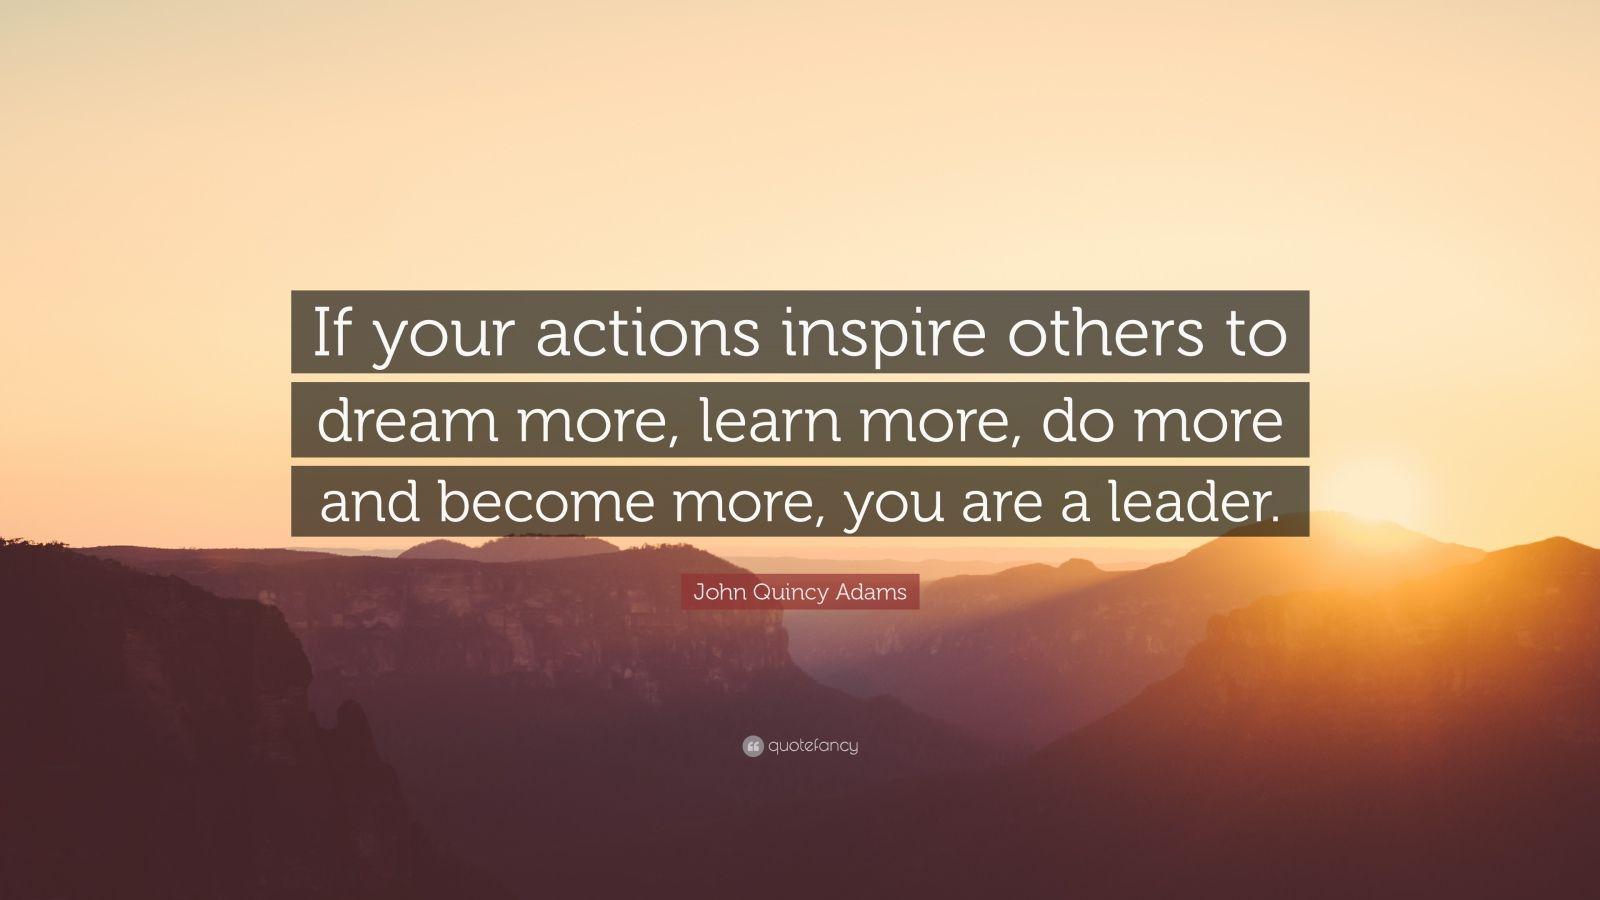 Albert Einstein Wallpaper Quotes John Quincy Adams Quote If Your Actions Inspire Others